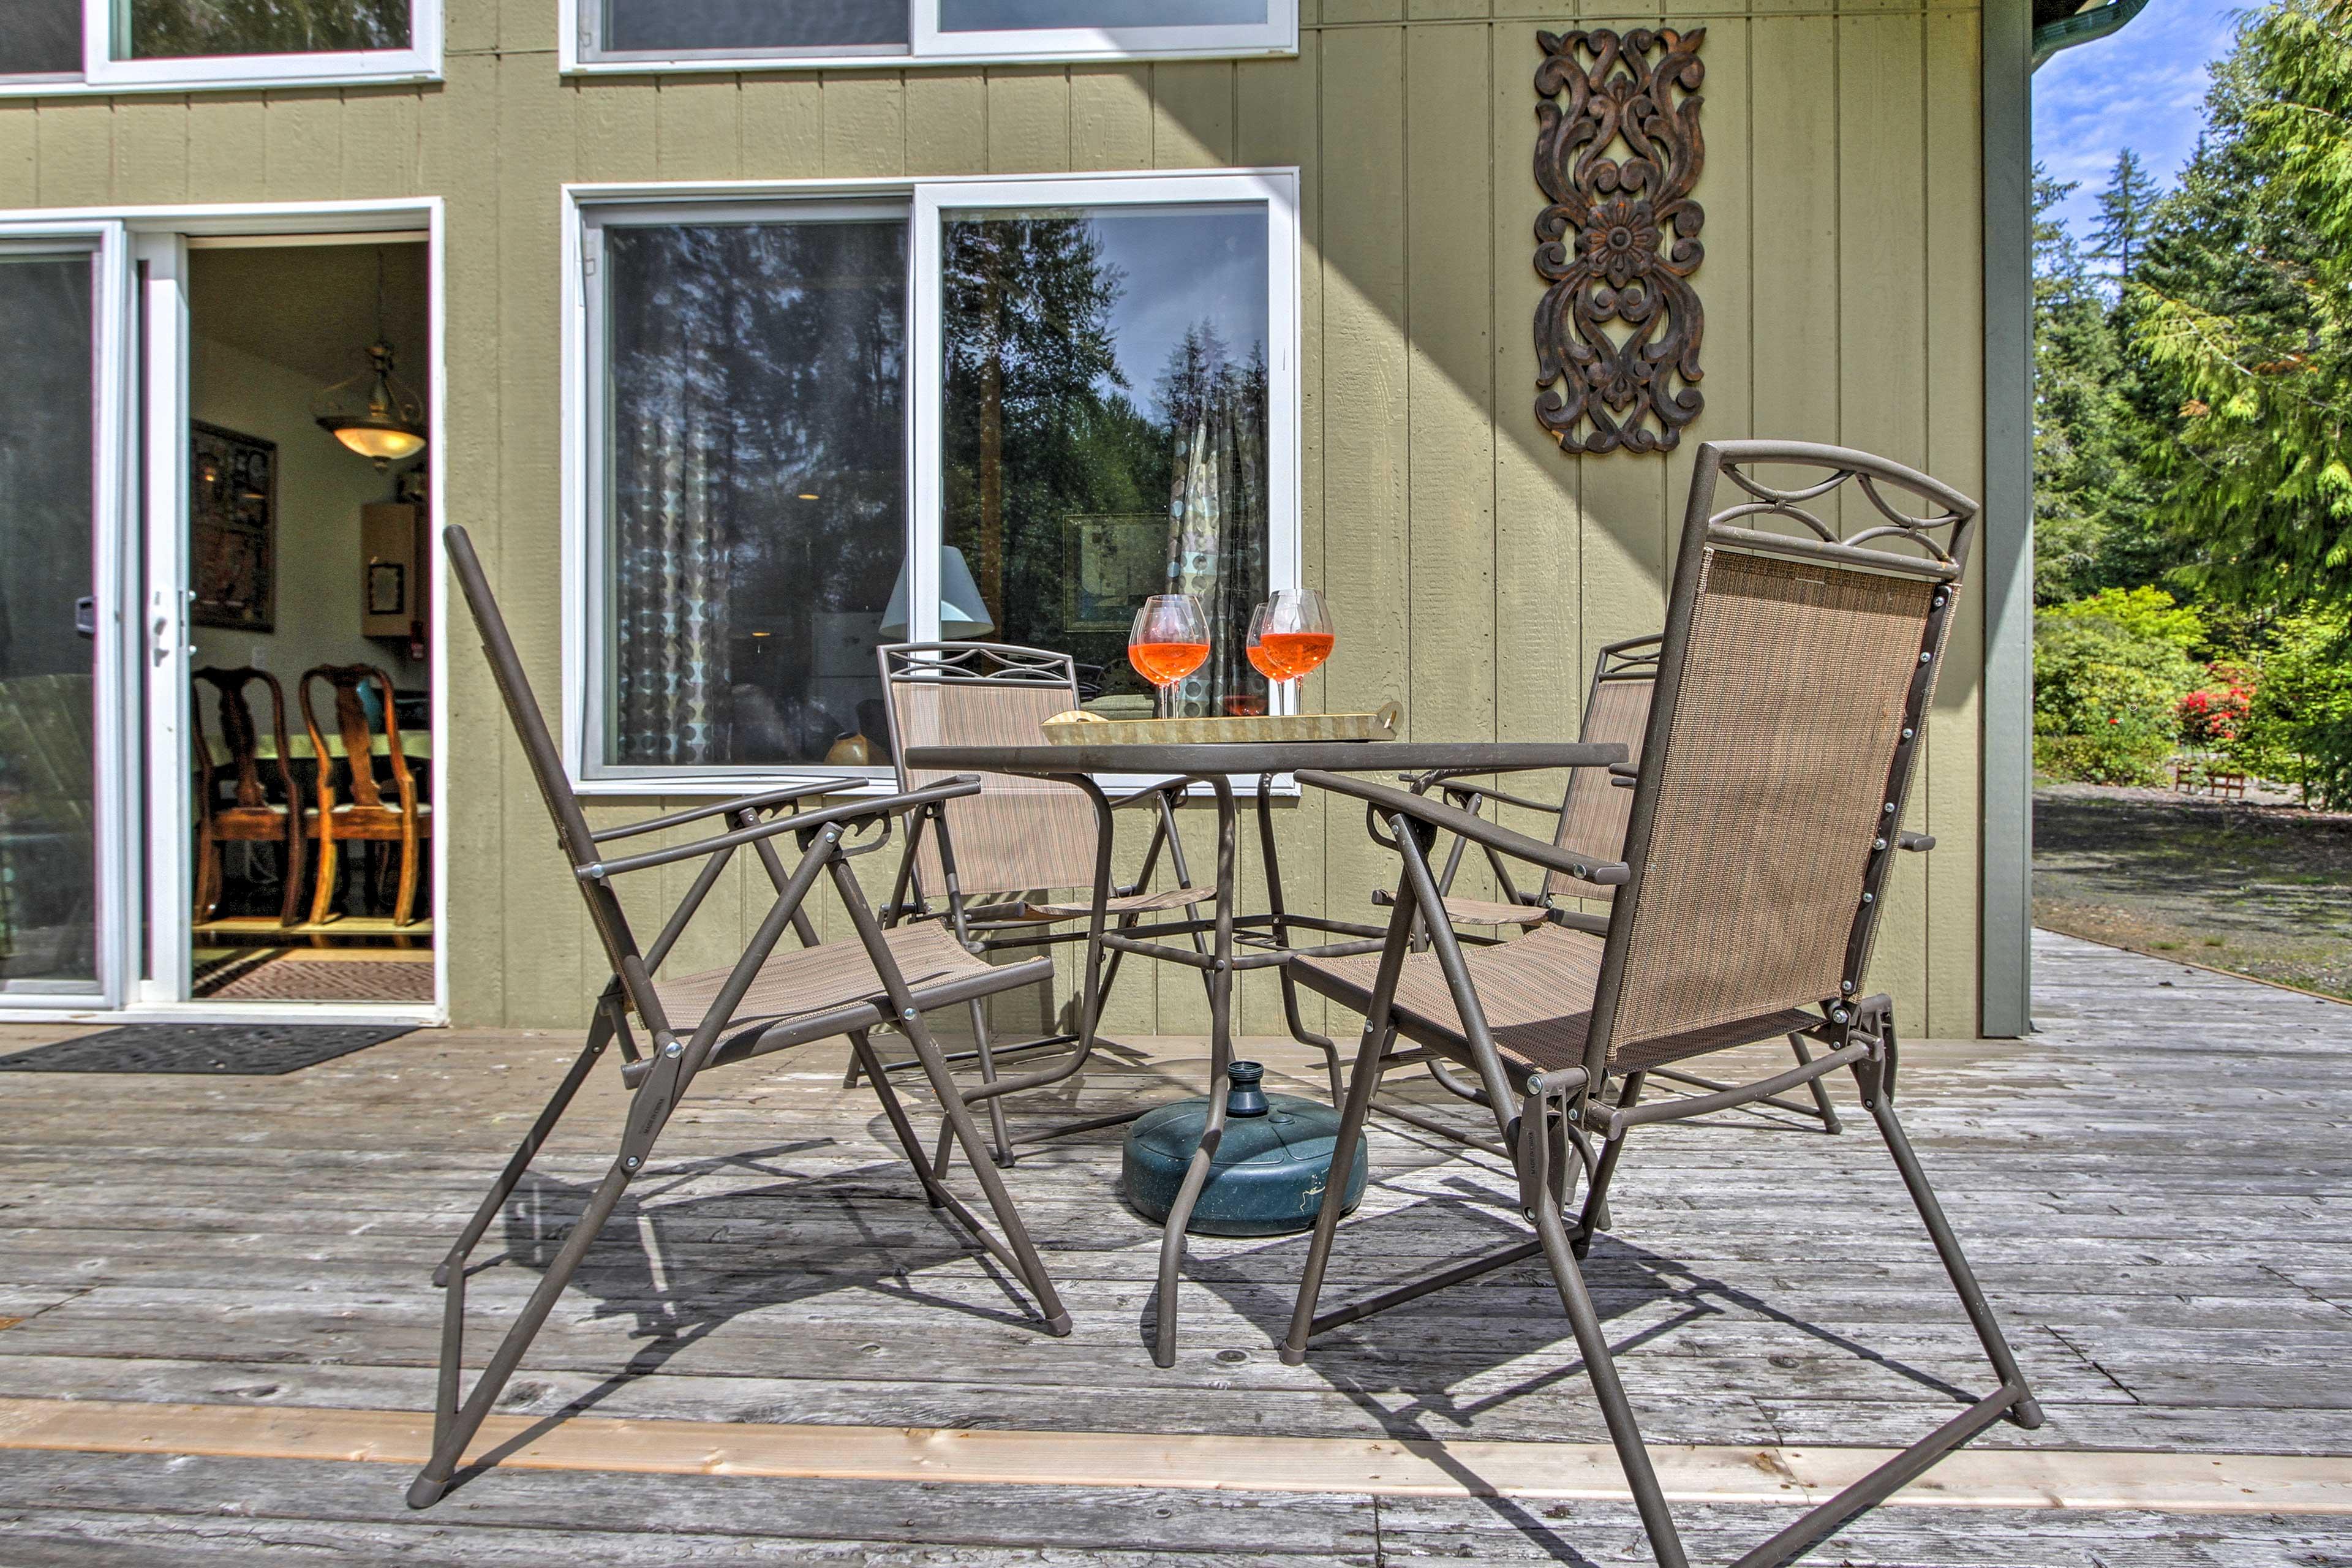 Dine al fresco on the furnished deck!